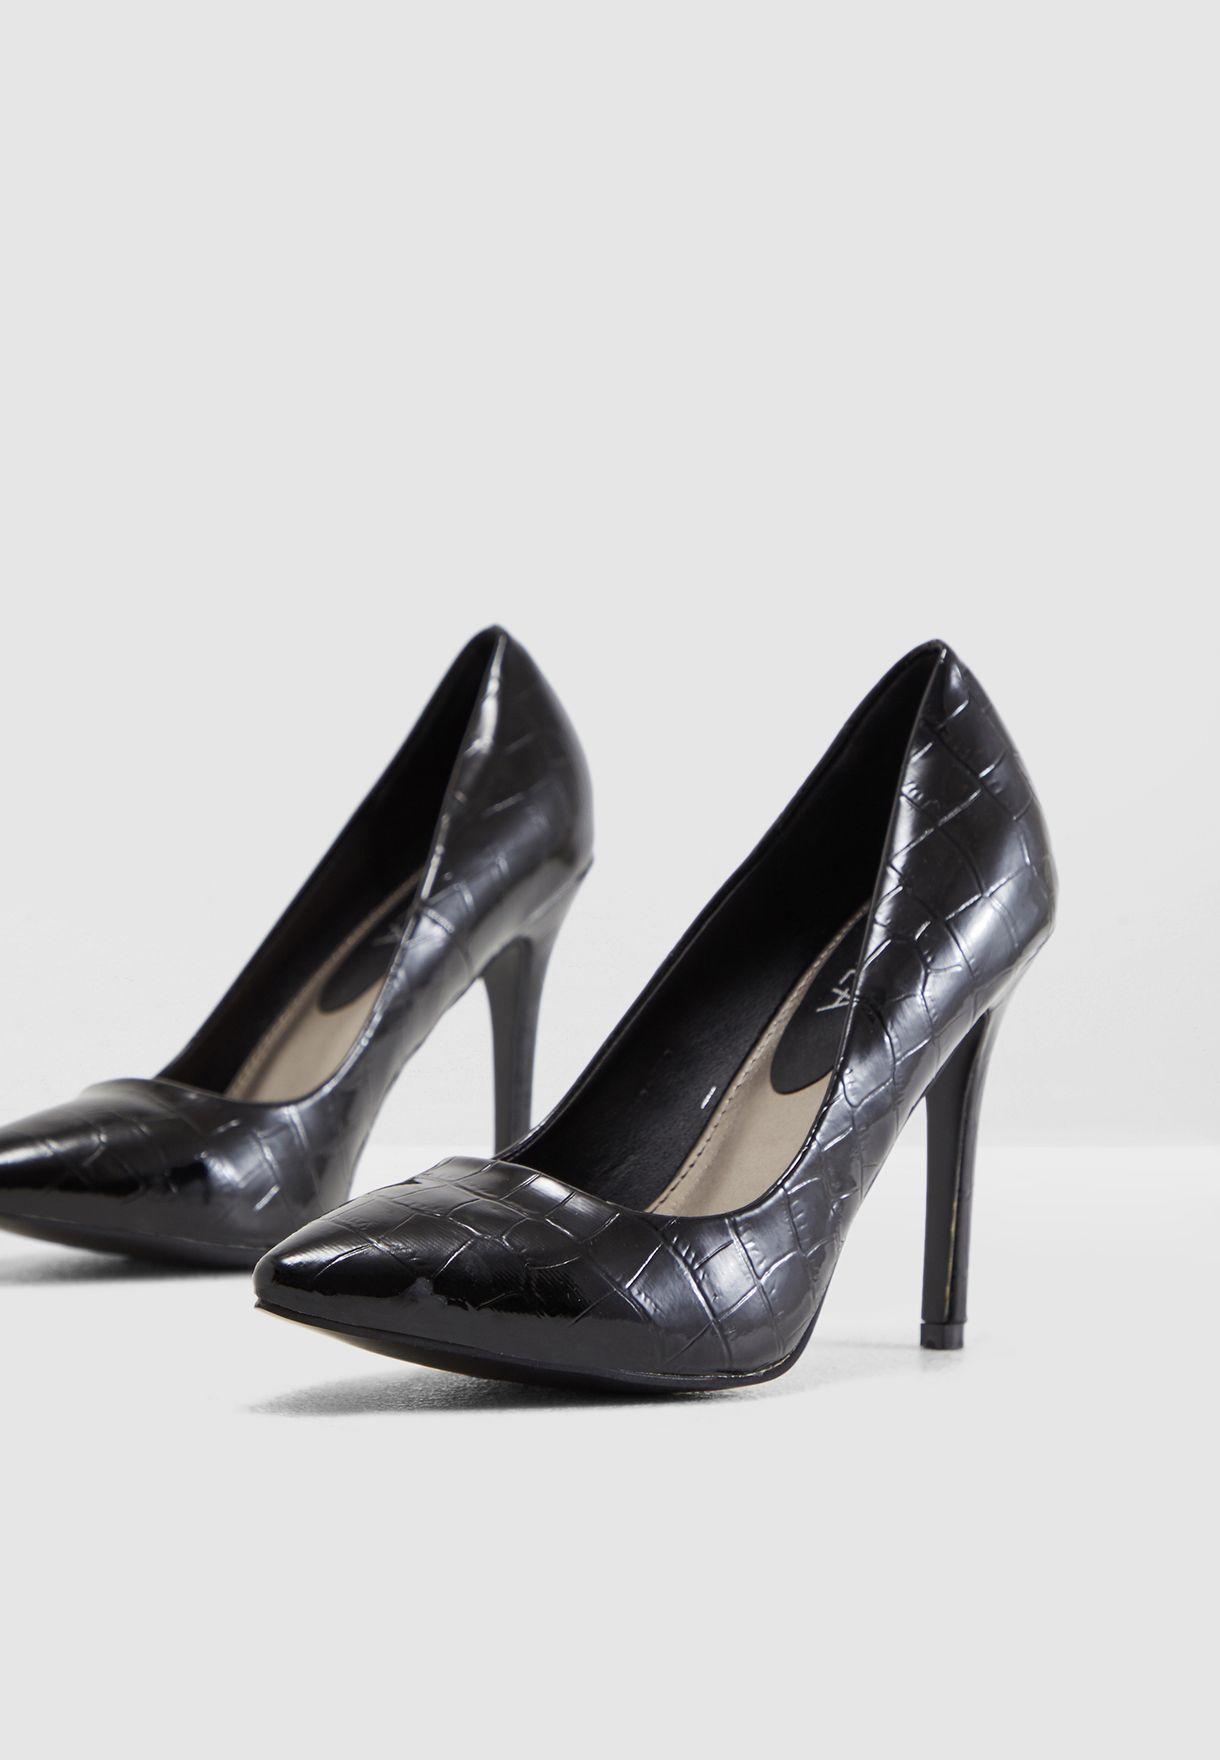 d29ac27e0cd18 تسوق حذاء عصري بكعب عالي ماركة ايلا لون أسود F9732 AP1 في السعودية ...